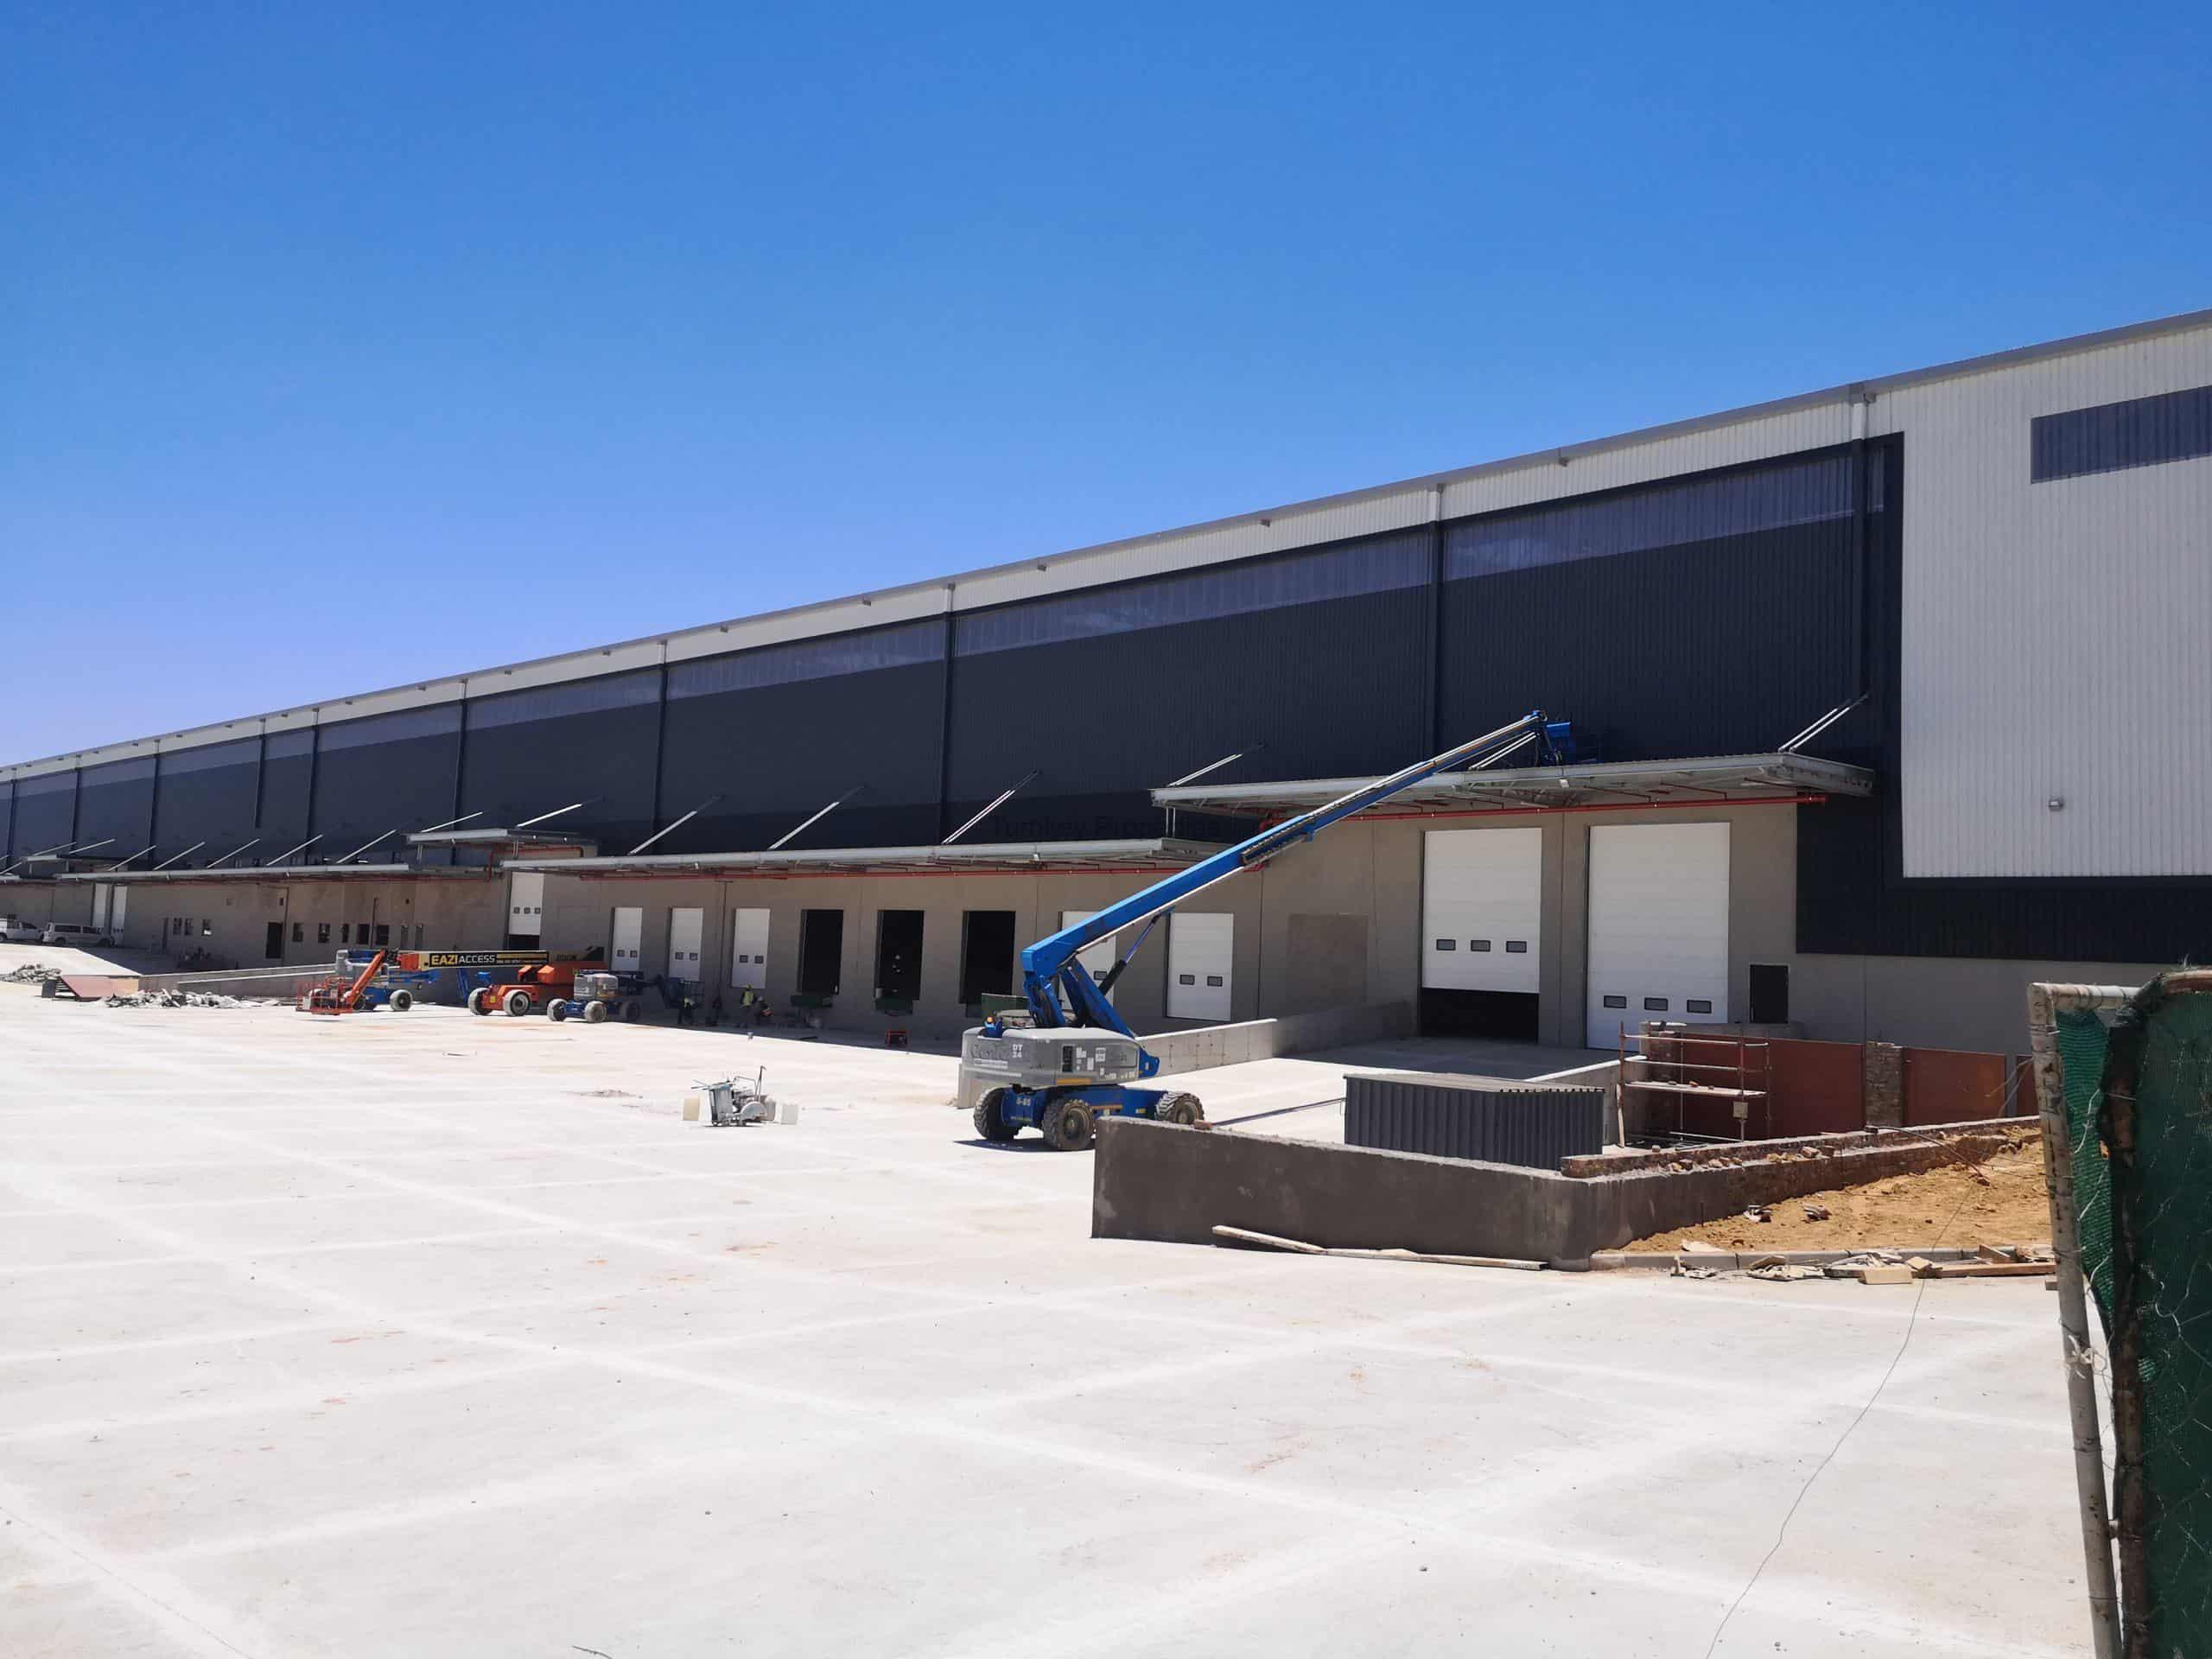 24148m² Warehouse Space to Rent Longlake Longlake Logistics Park